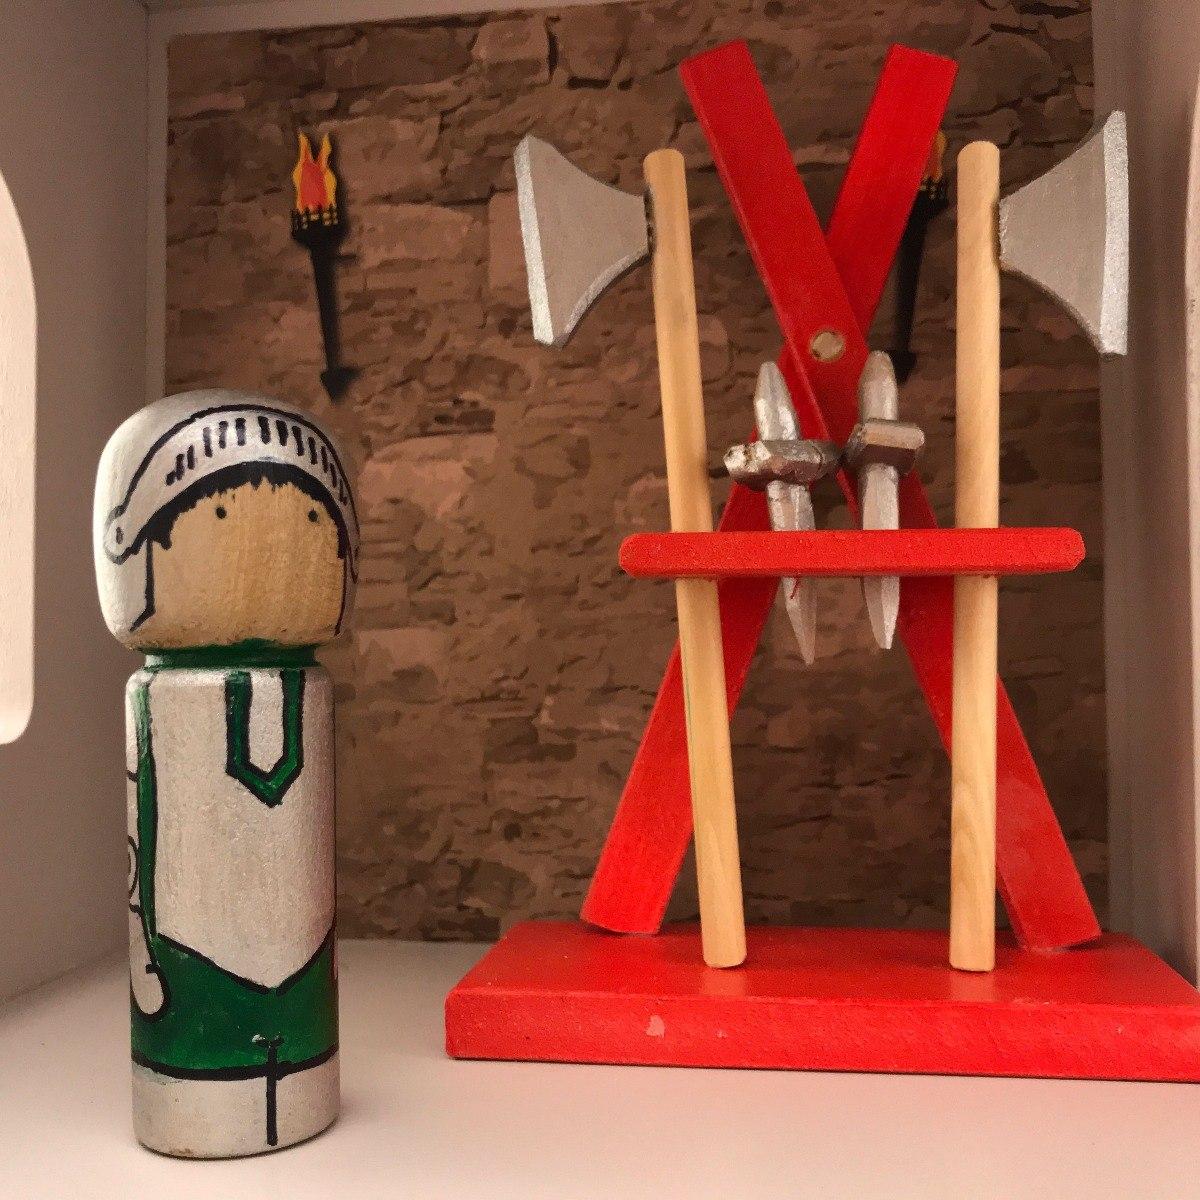 Castillo Medival Fuerte Personajes Muebles Casa Juguetes  # Muebles Waldorf